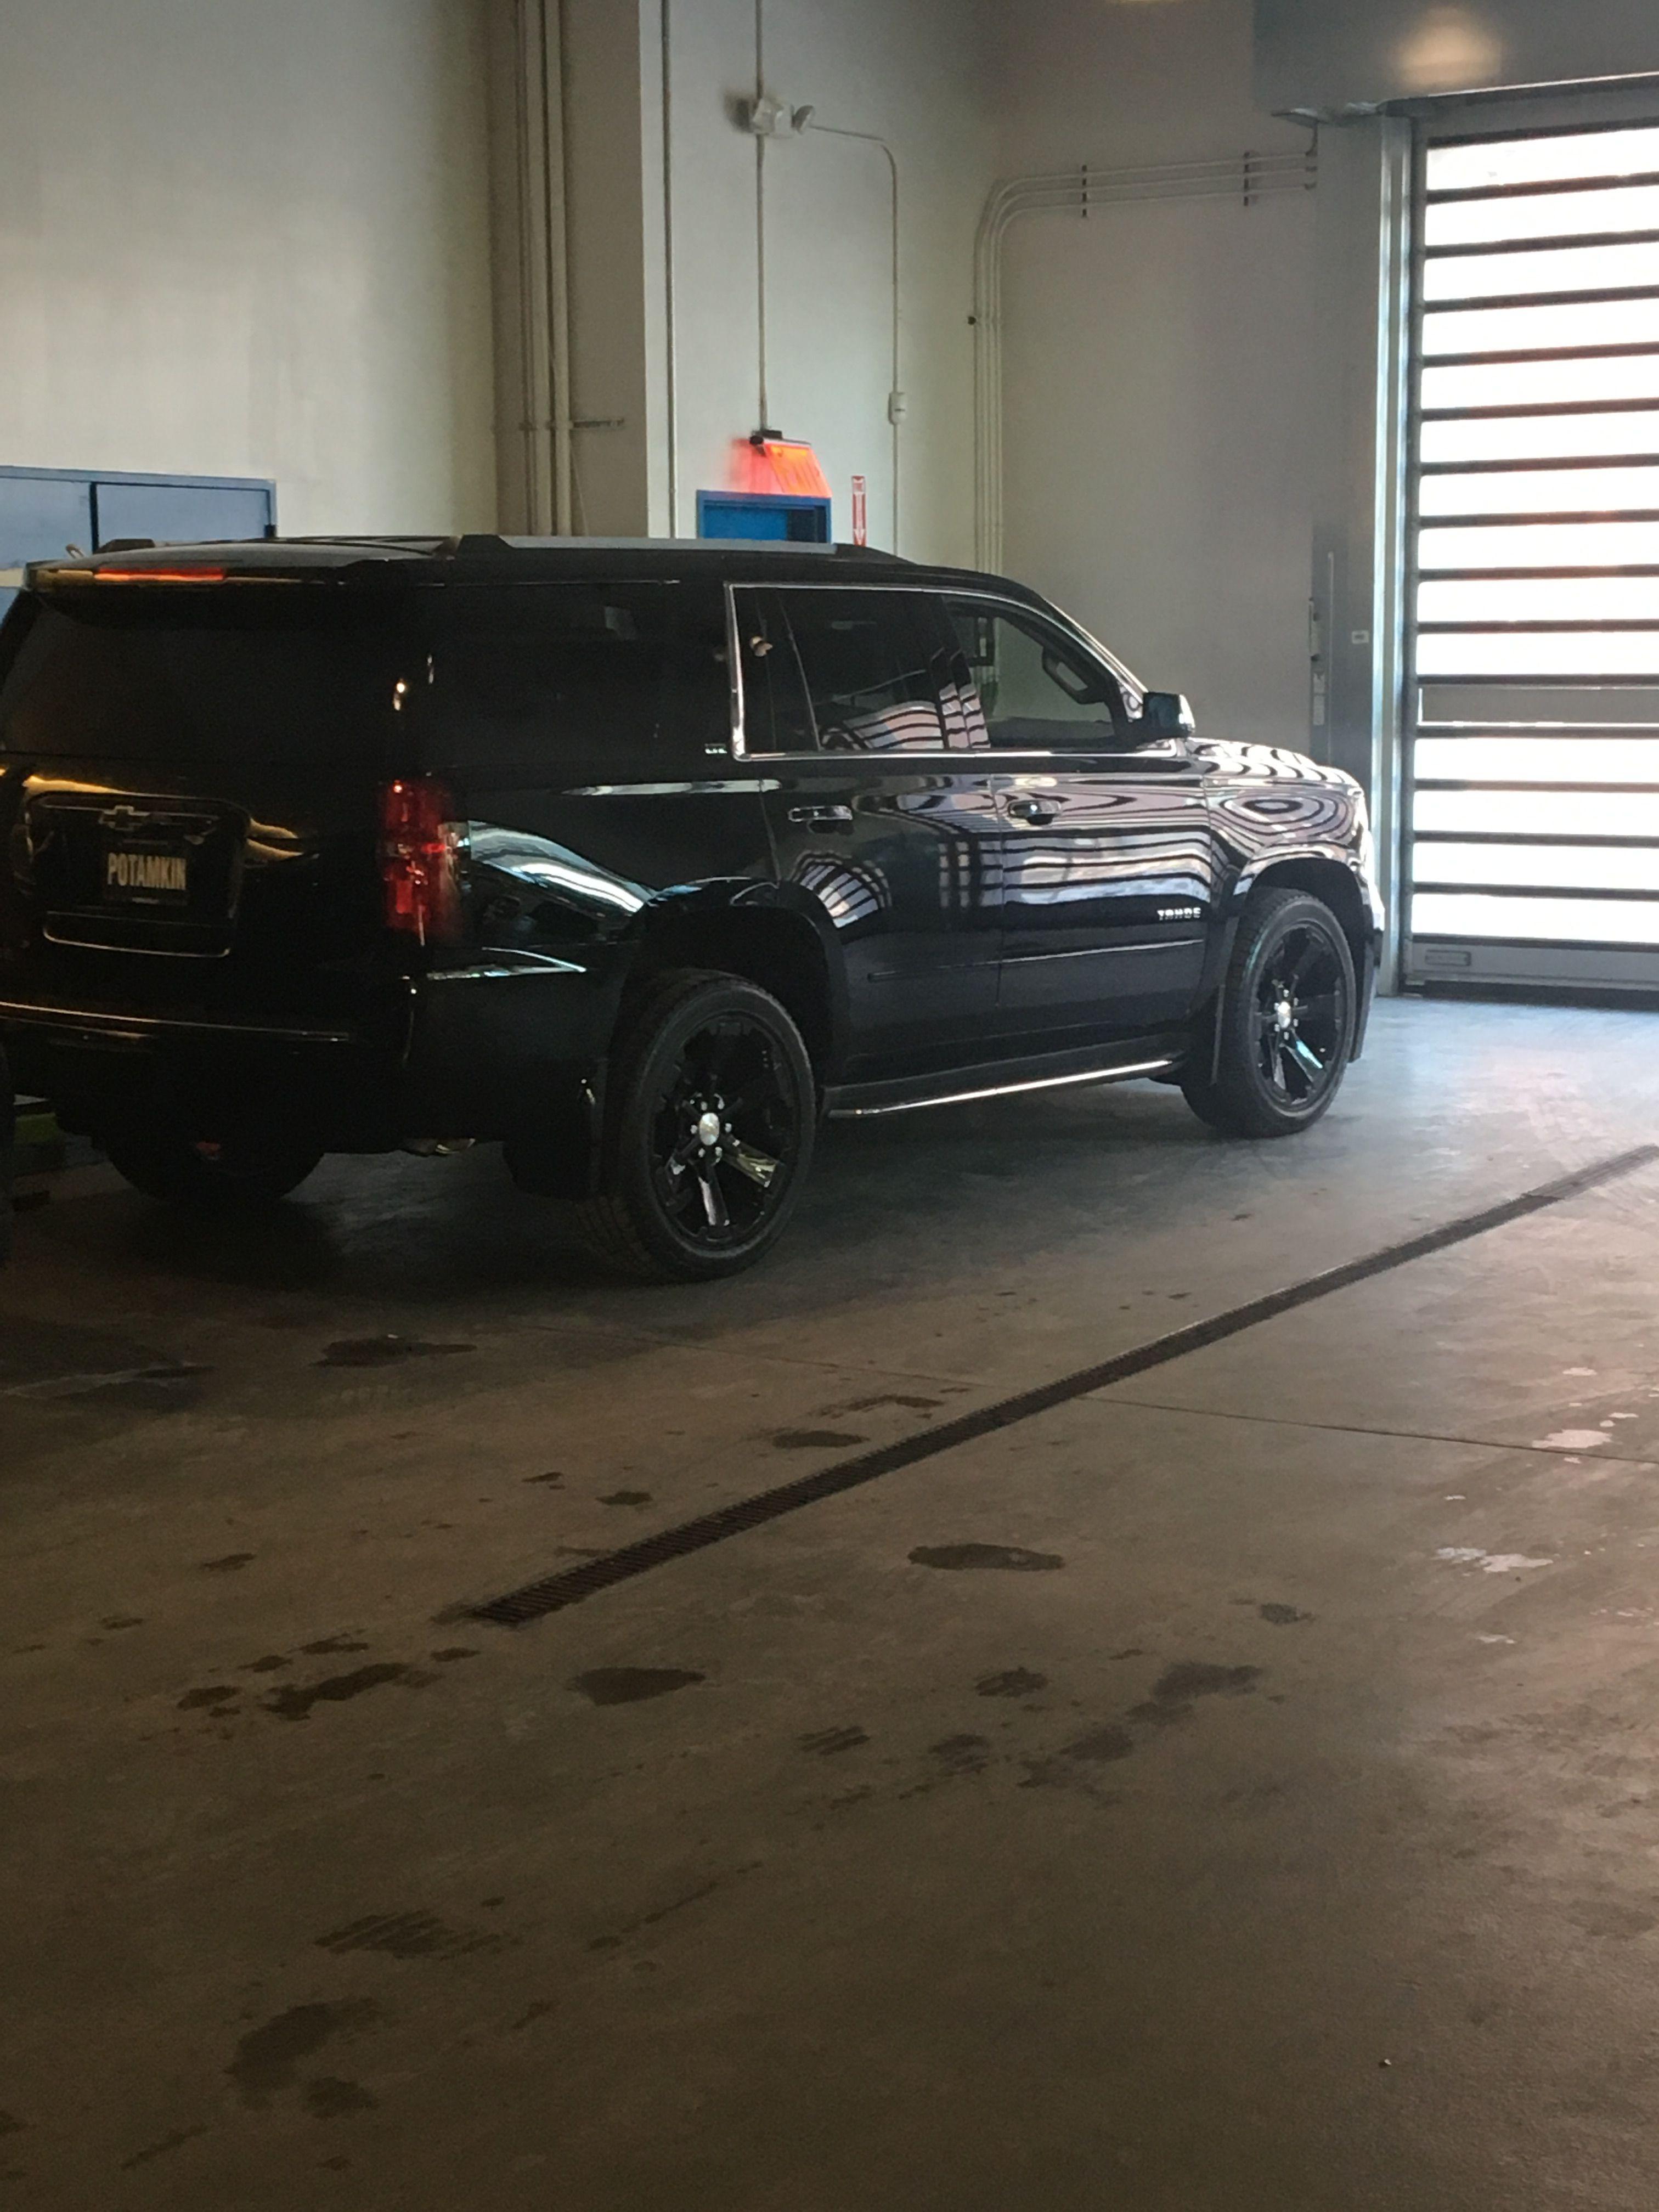 Weathertech floor mats grand forks - Top 17 Idei Despre 2015 Chevy Tahoe Pe Pinterest Chevrolet Tahoe Lifted Chevy Trucks I Ma Ini Mari